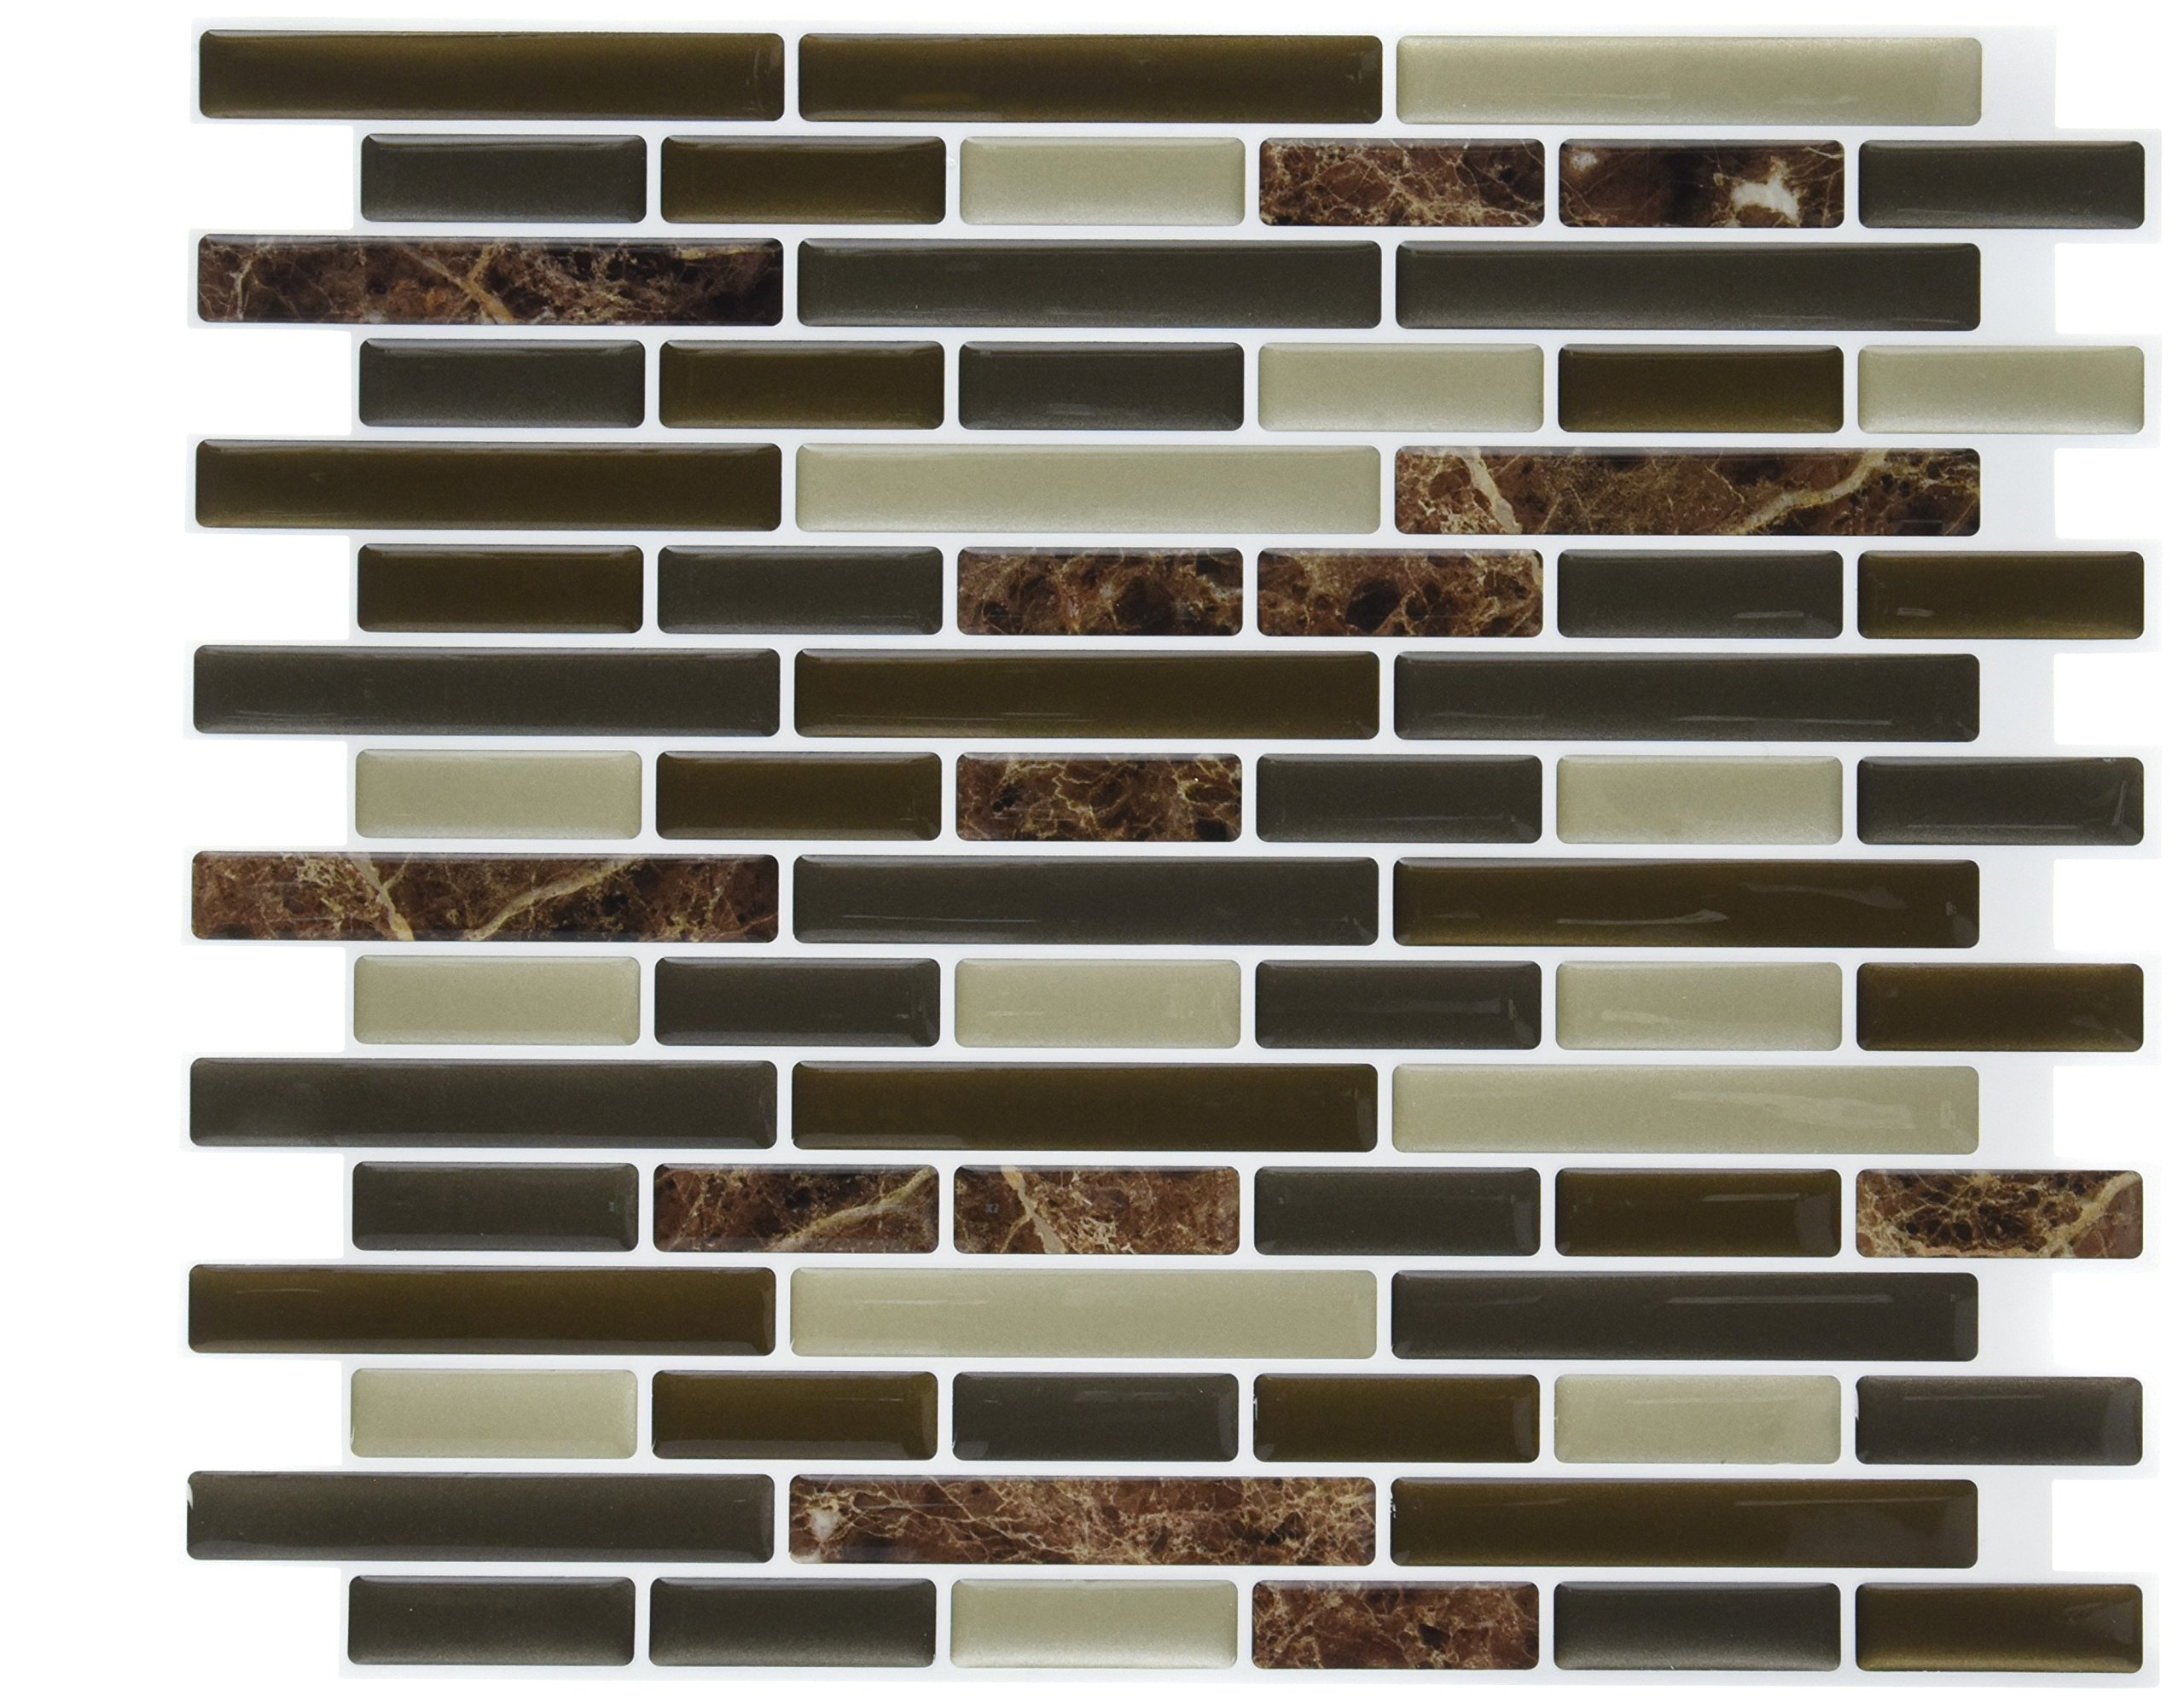 Peel & Impress 11'' X 9.25'' Adhesive Vinyl Wall Tiles Bulk 40 RNUM-Pack -Mixed Brown Oblong by Peel & Impress